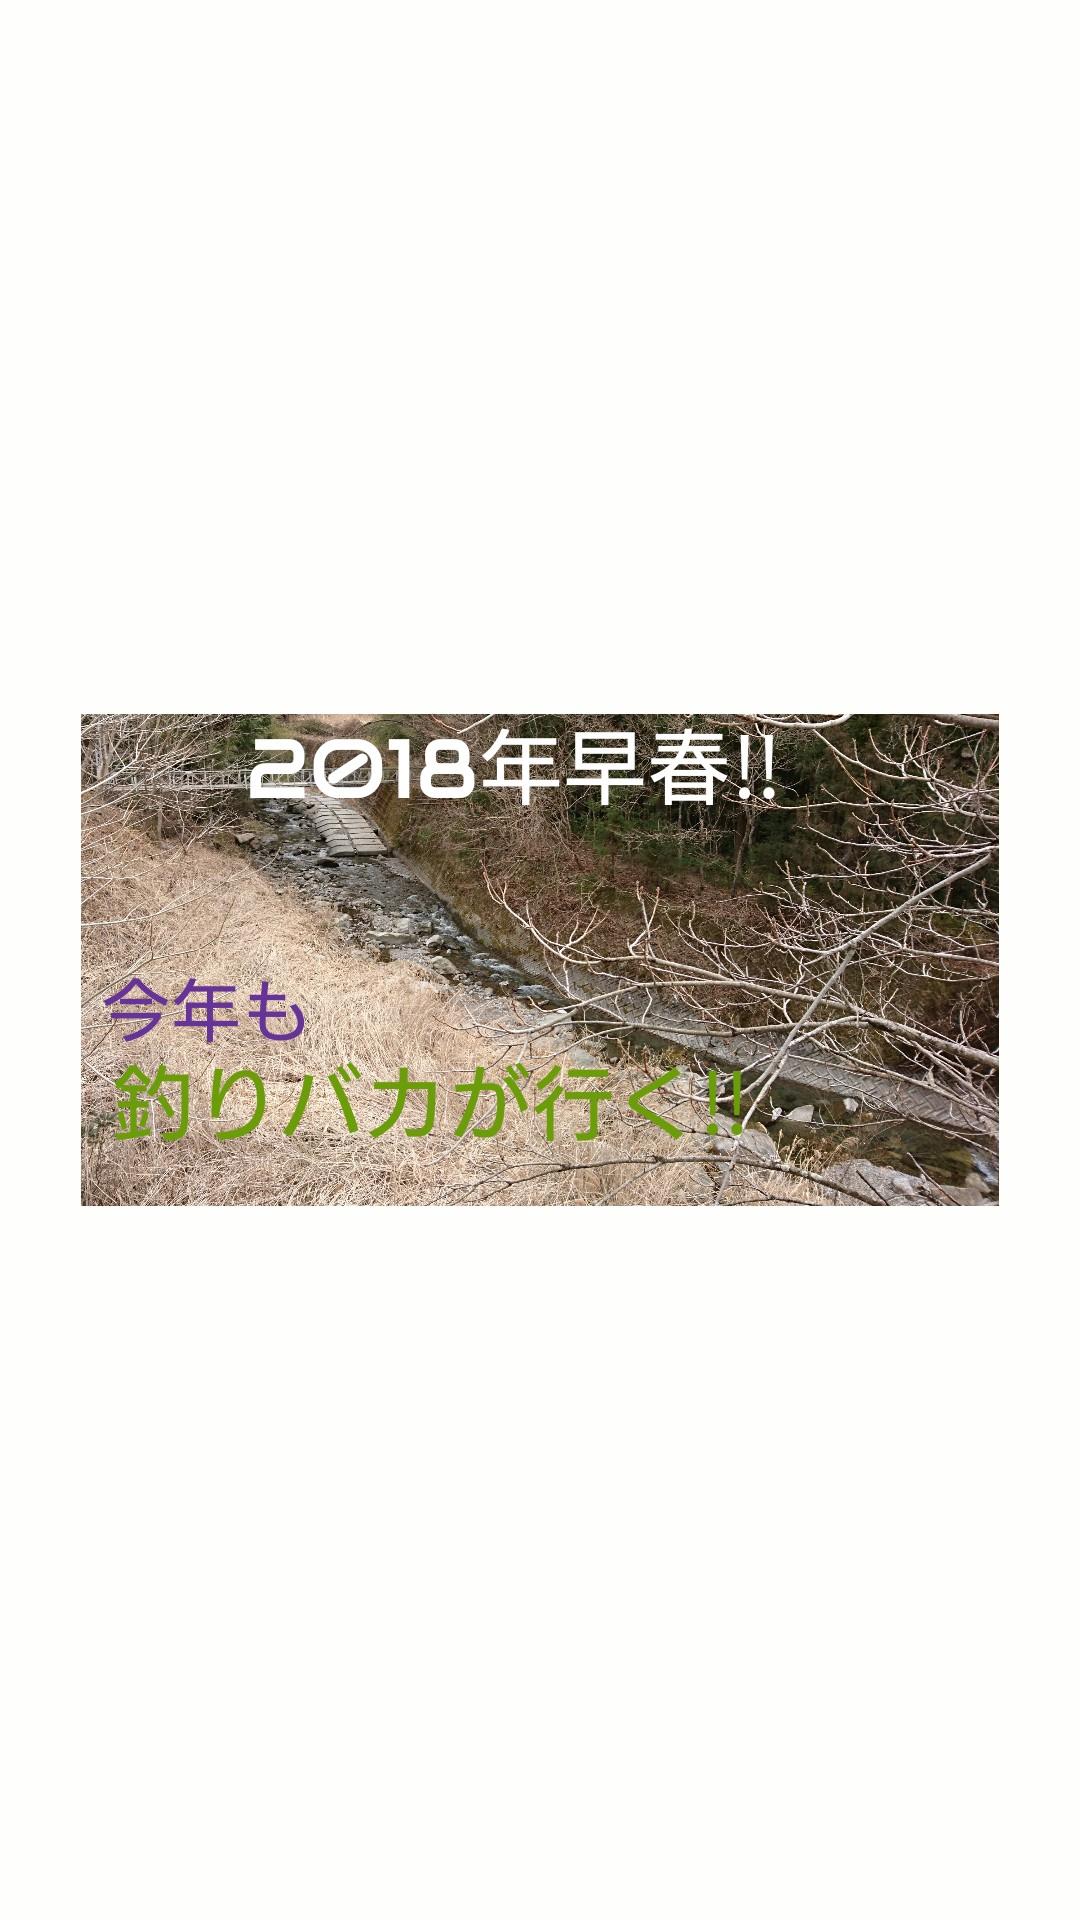 f:id:d-ninja:20180302175019j:image